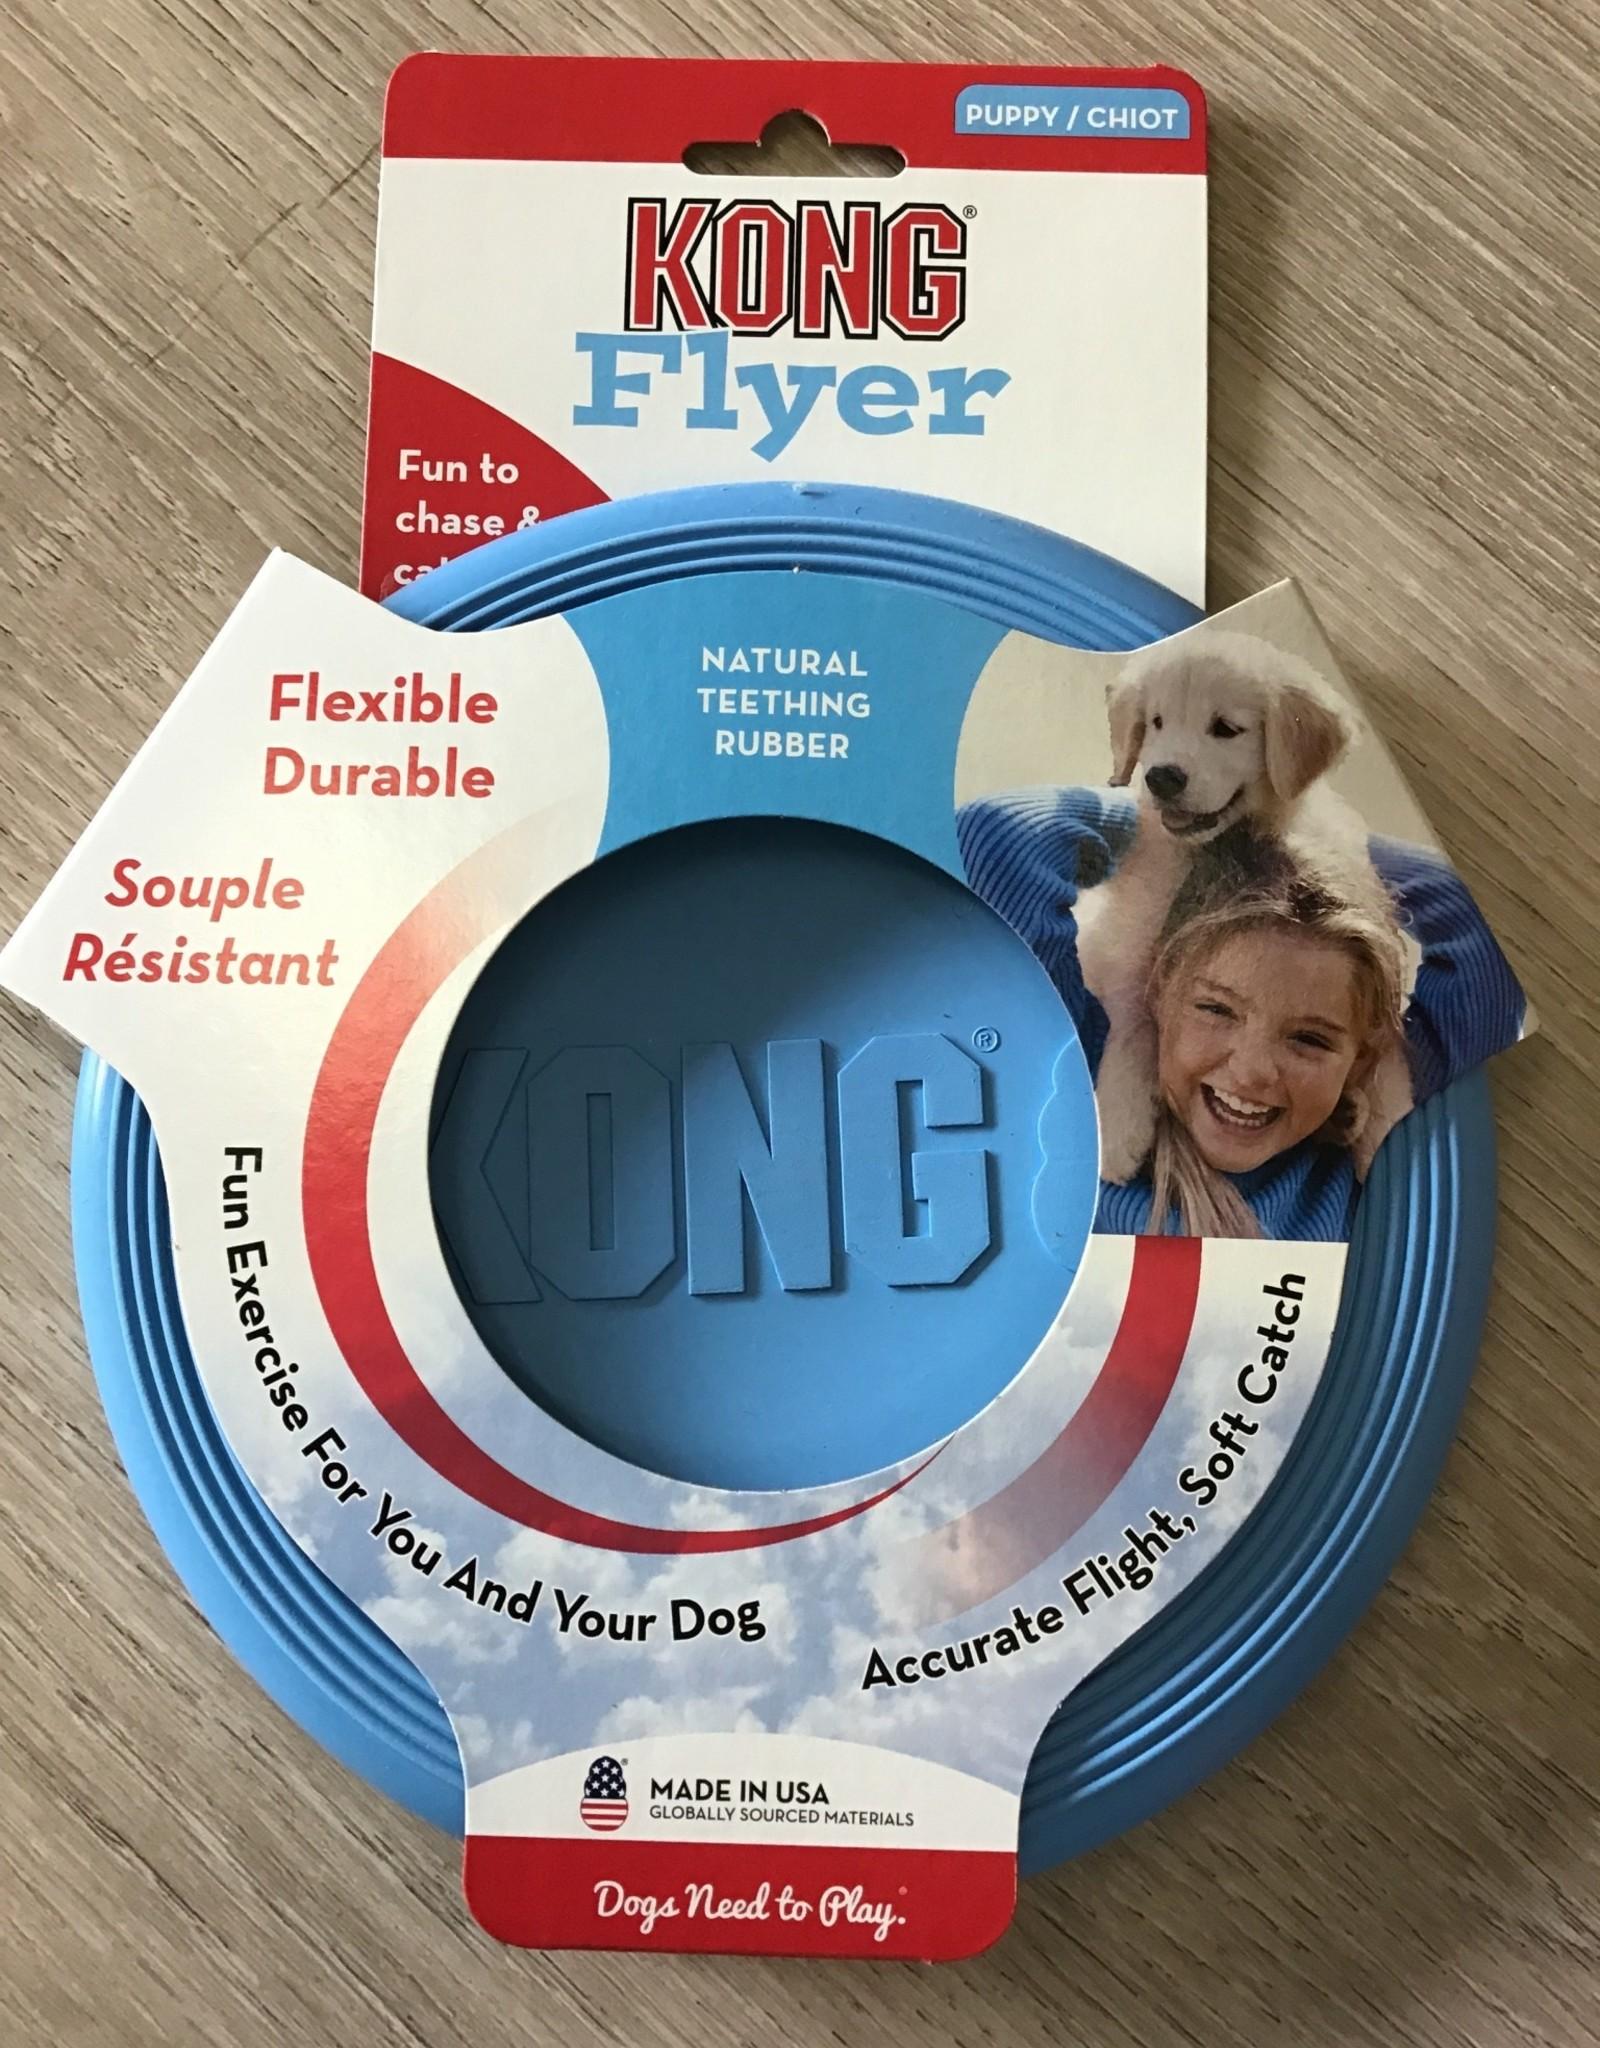 Kong Toys Flyer Puppy